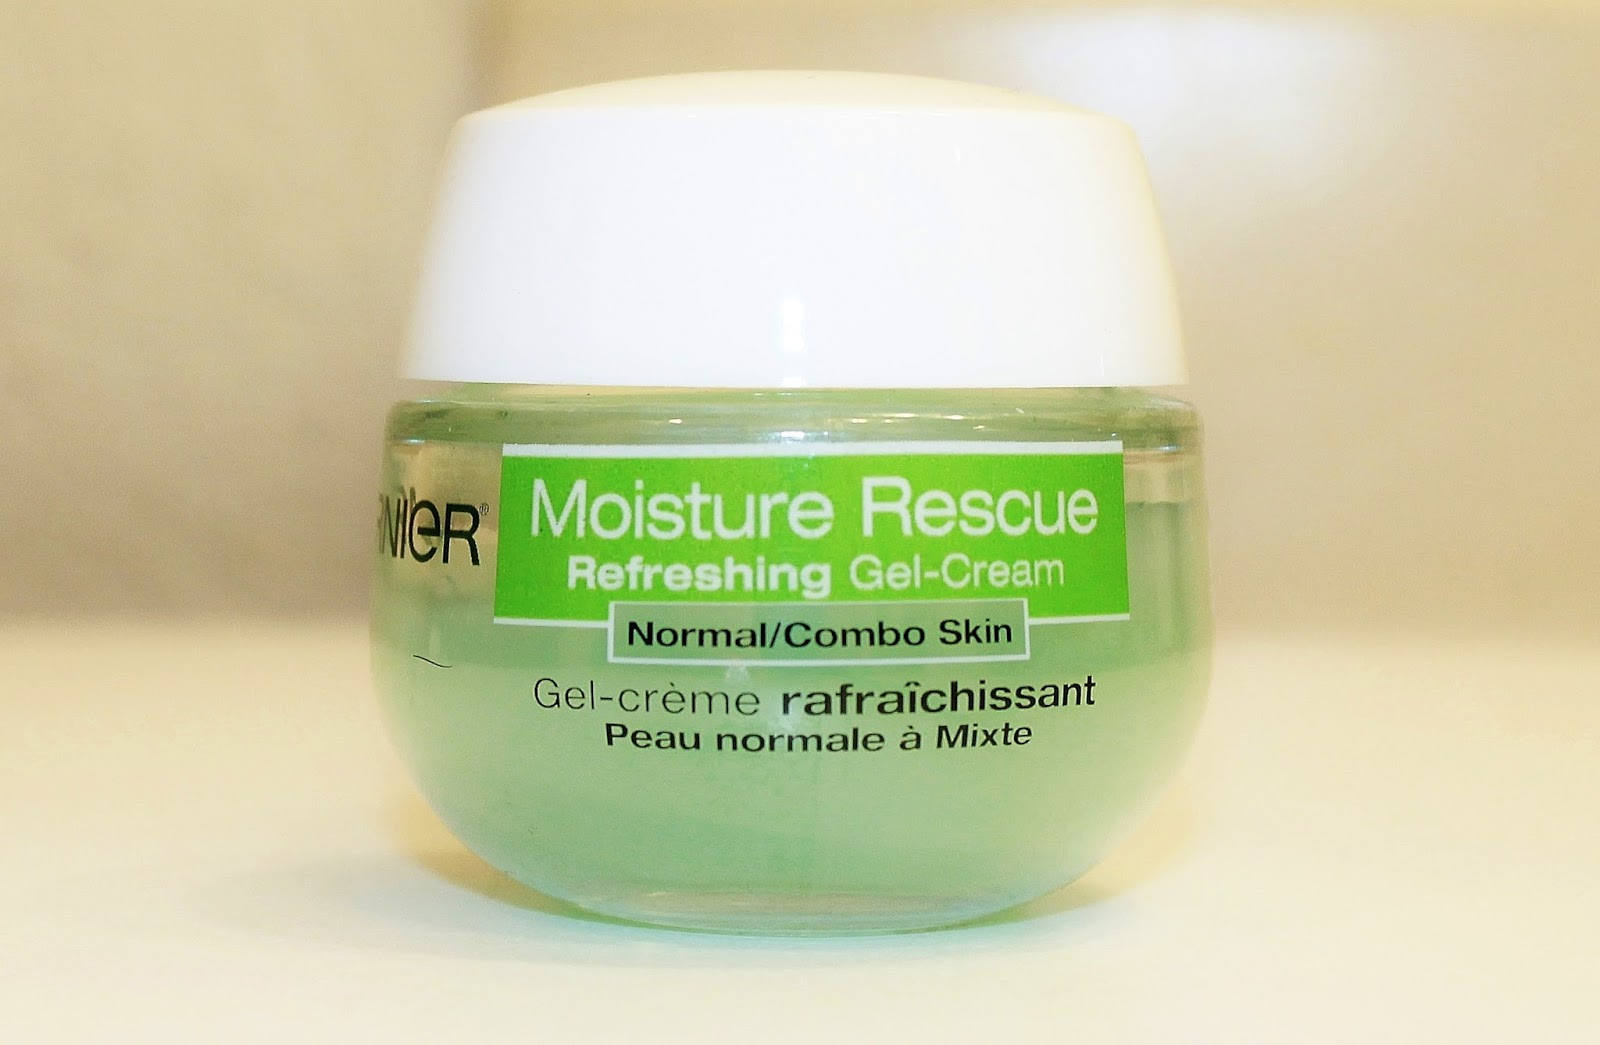 Garnier moisturizing gel